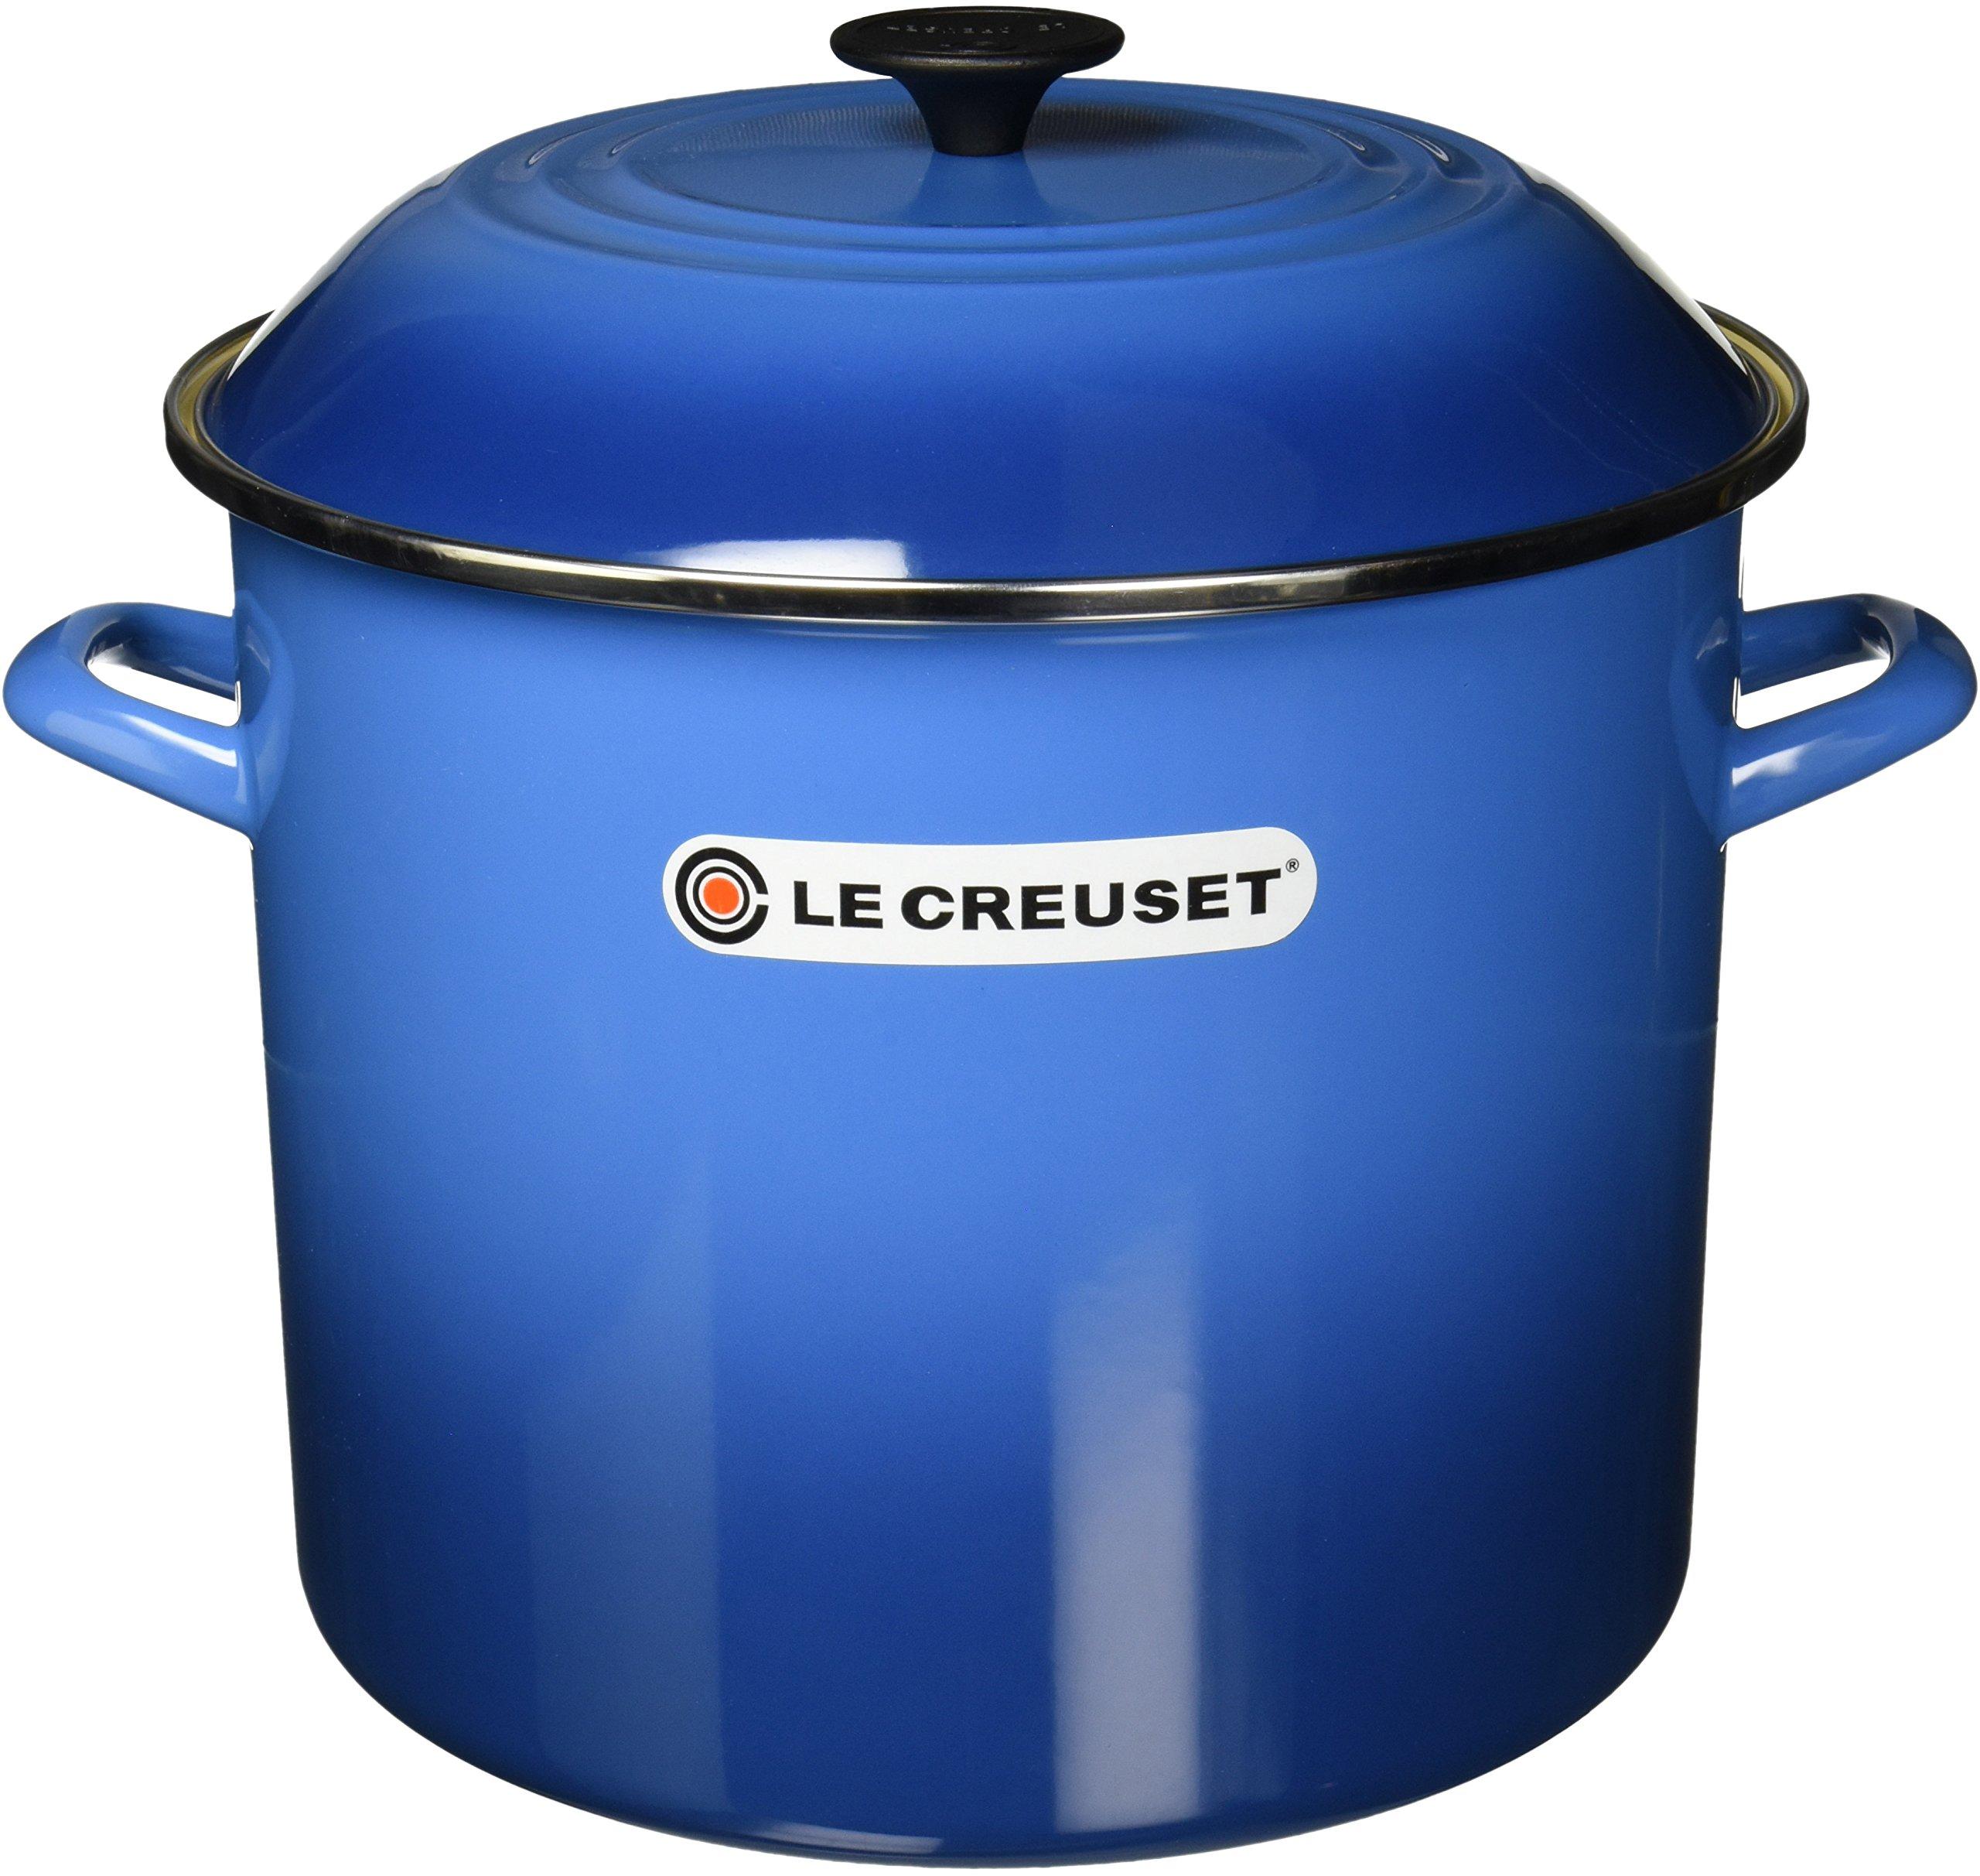 Le Creuset Enameled Steel 16-Quart Stock Pot with Lid, Marseille